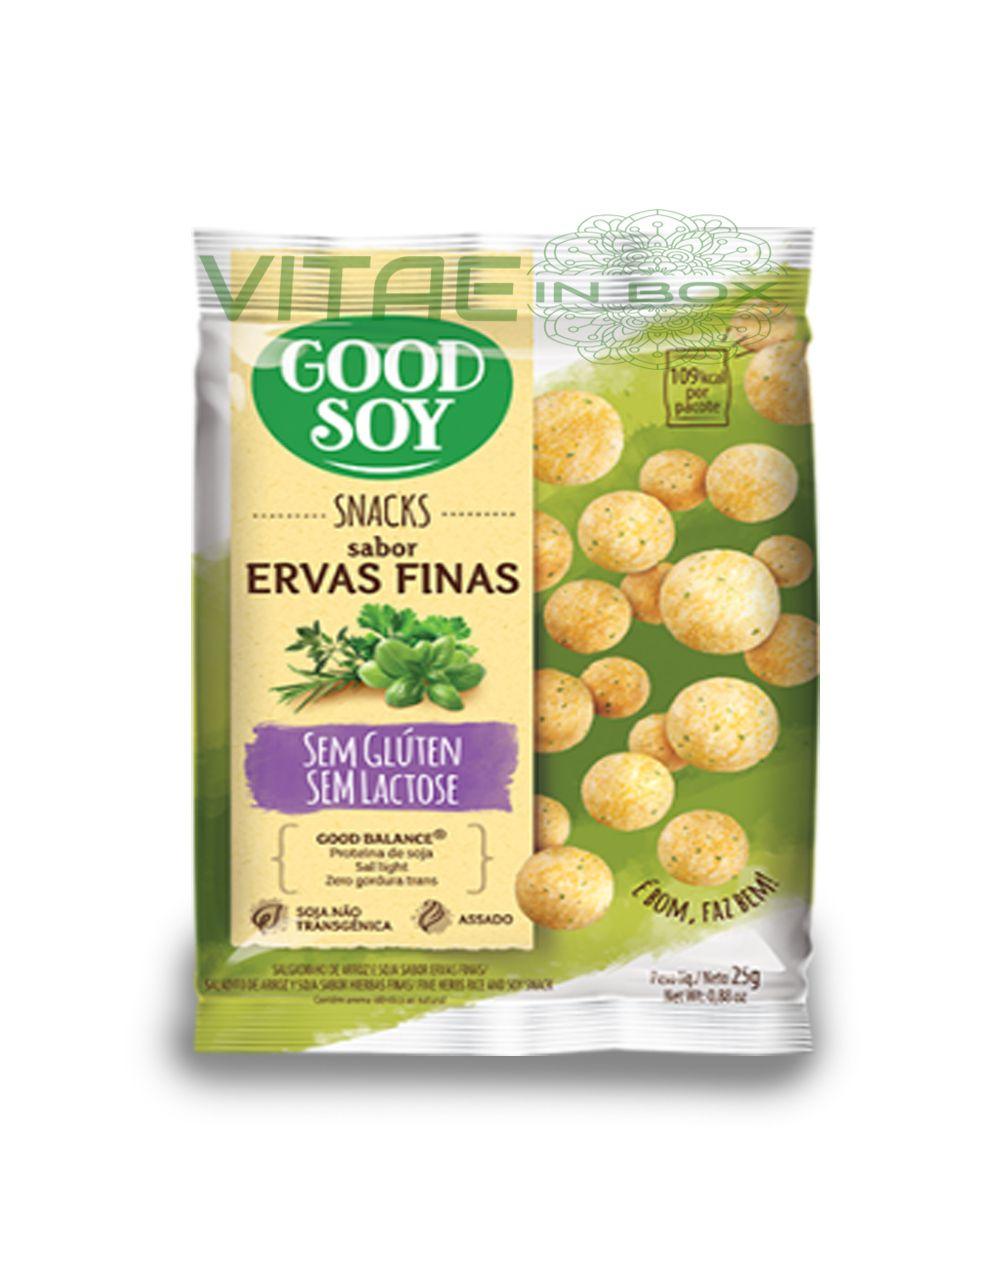 Snack Ervas Finas Sem Glúten Sem Lactose 25g - GoodSoy